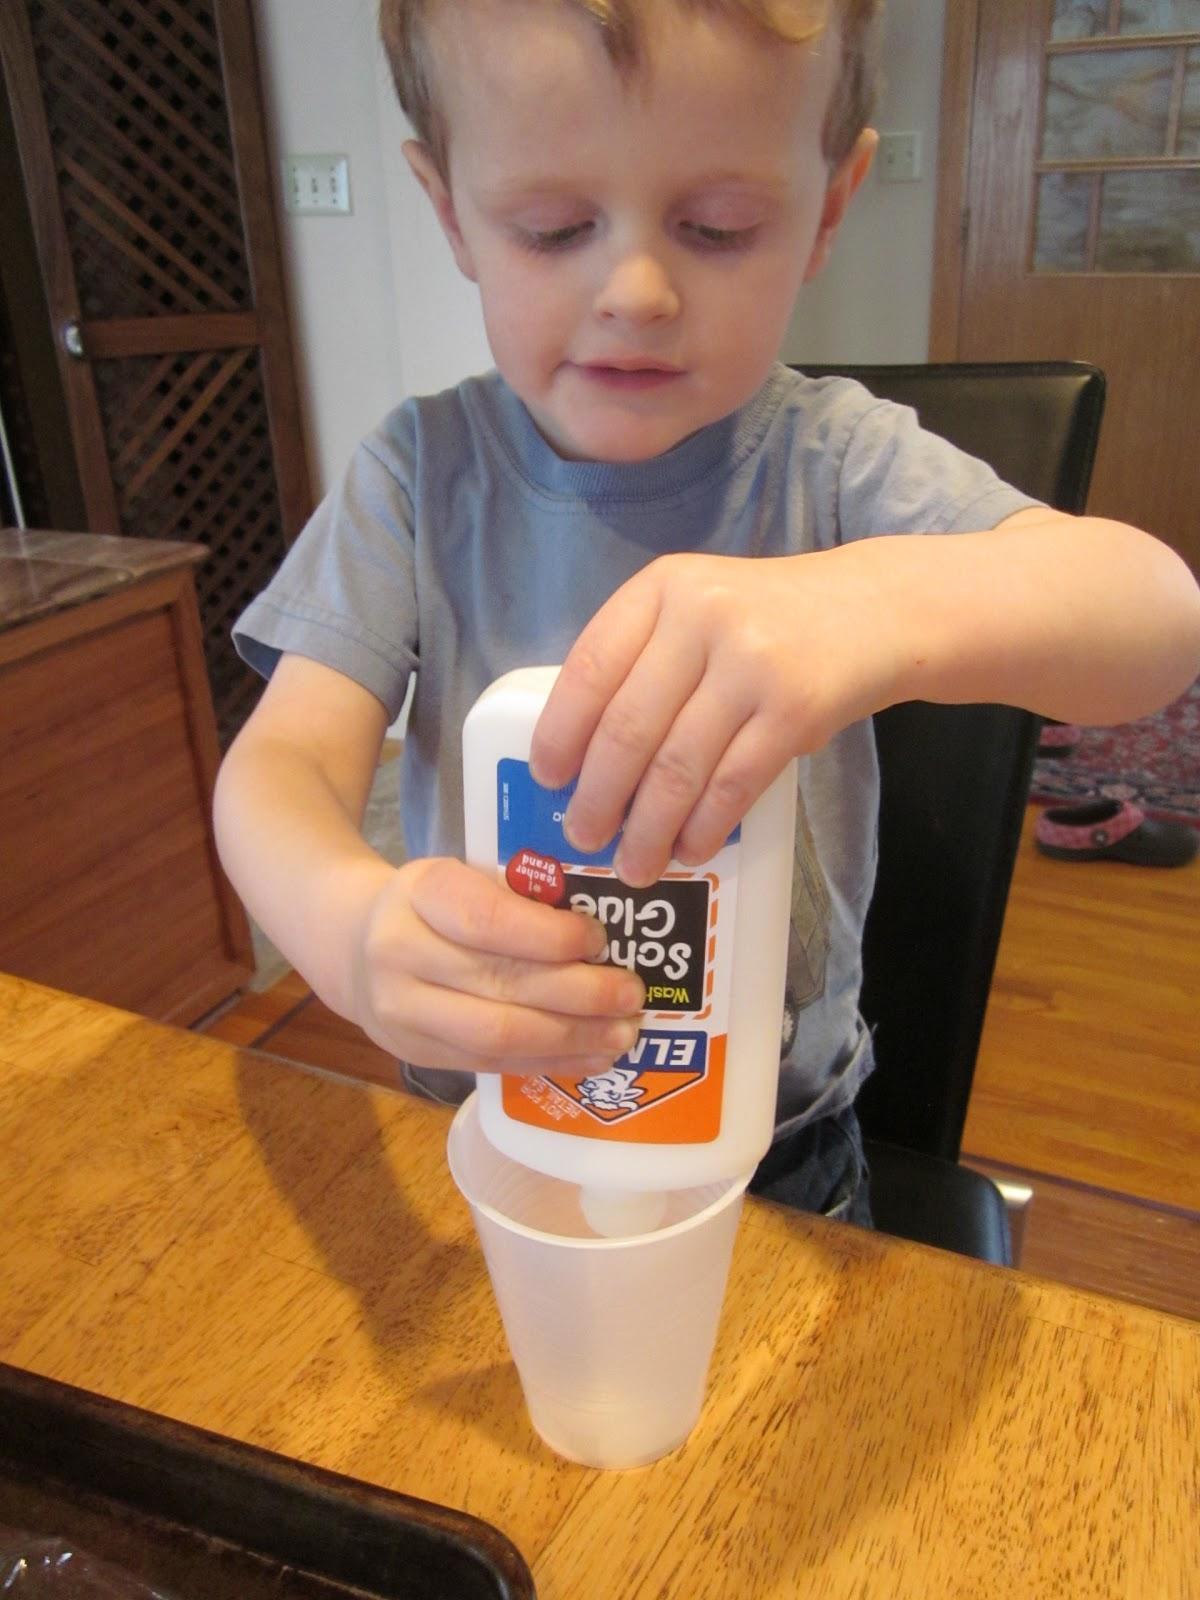 http://1.bp.blogspot.com/-Iiy4wguZIJQ/TZuEN-MFhyI/AAAAAAAAIZc/RfdOVVCREyQ/s1600/1+glue+in+bottle.JPG